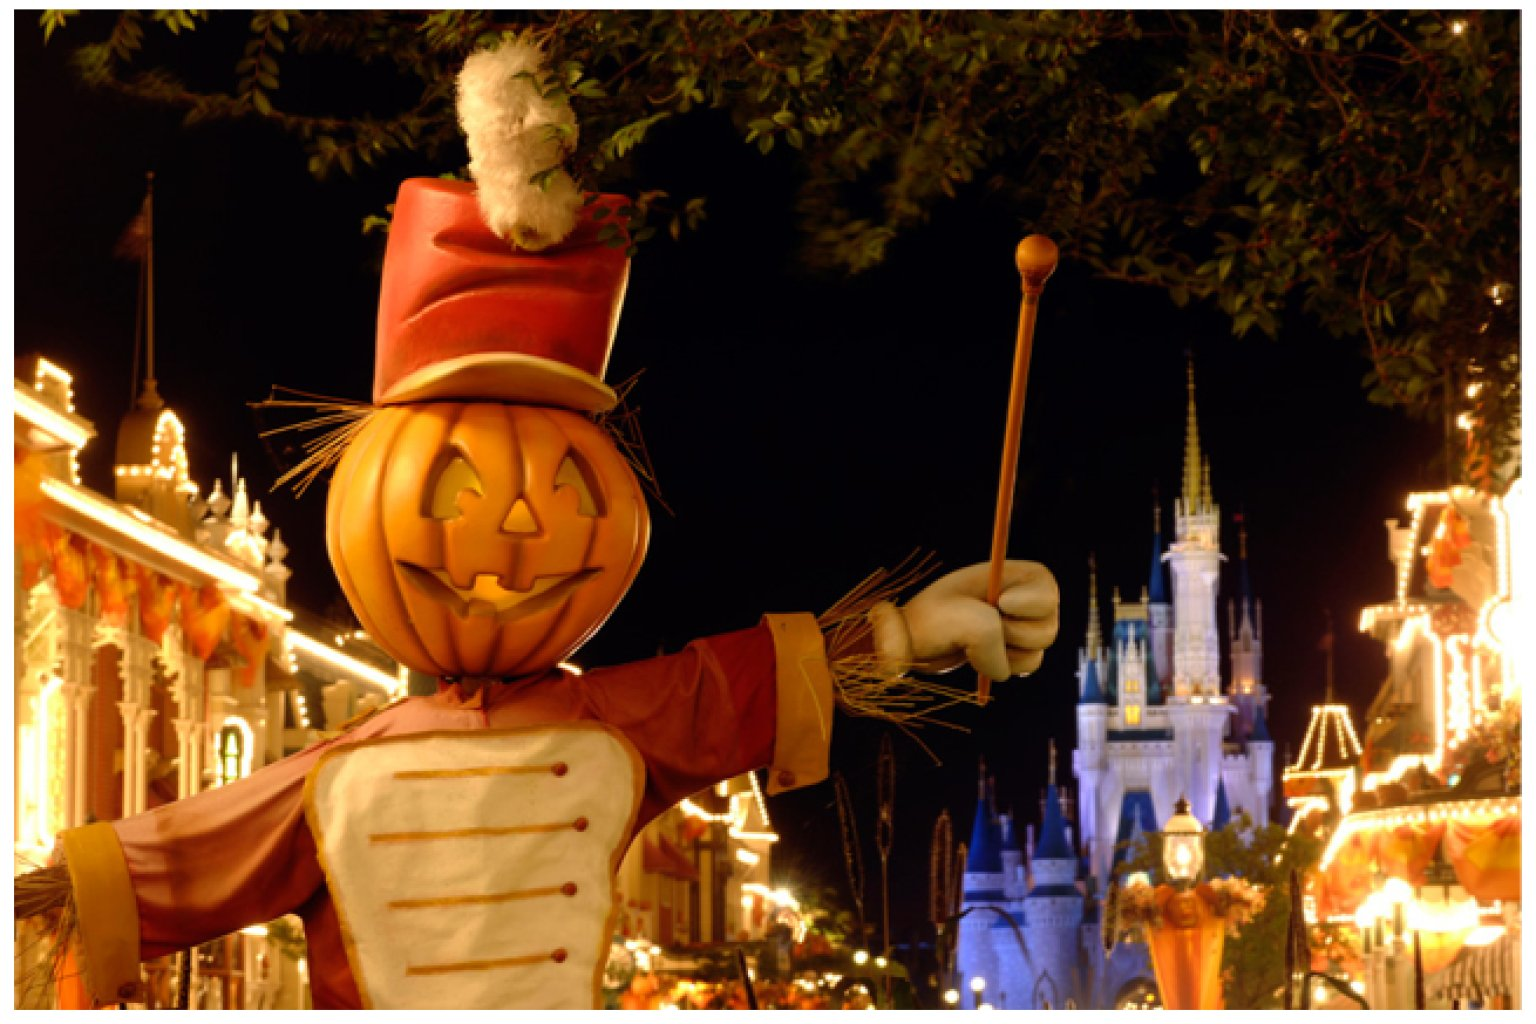 haunting and magical halloween at walt disney world huffpost - Disney Halloween Orlando